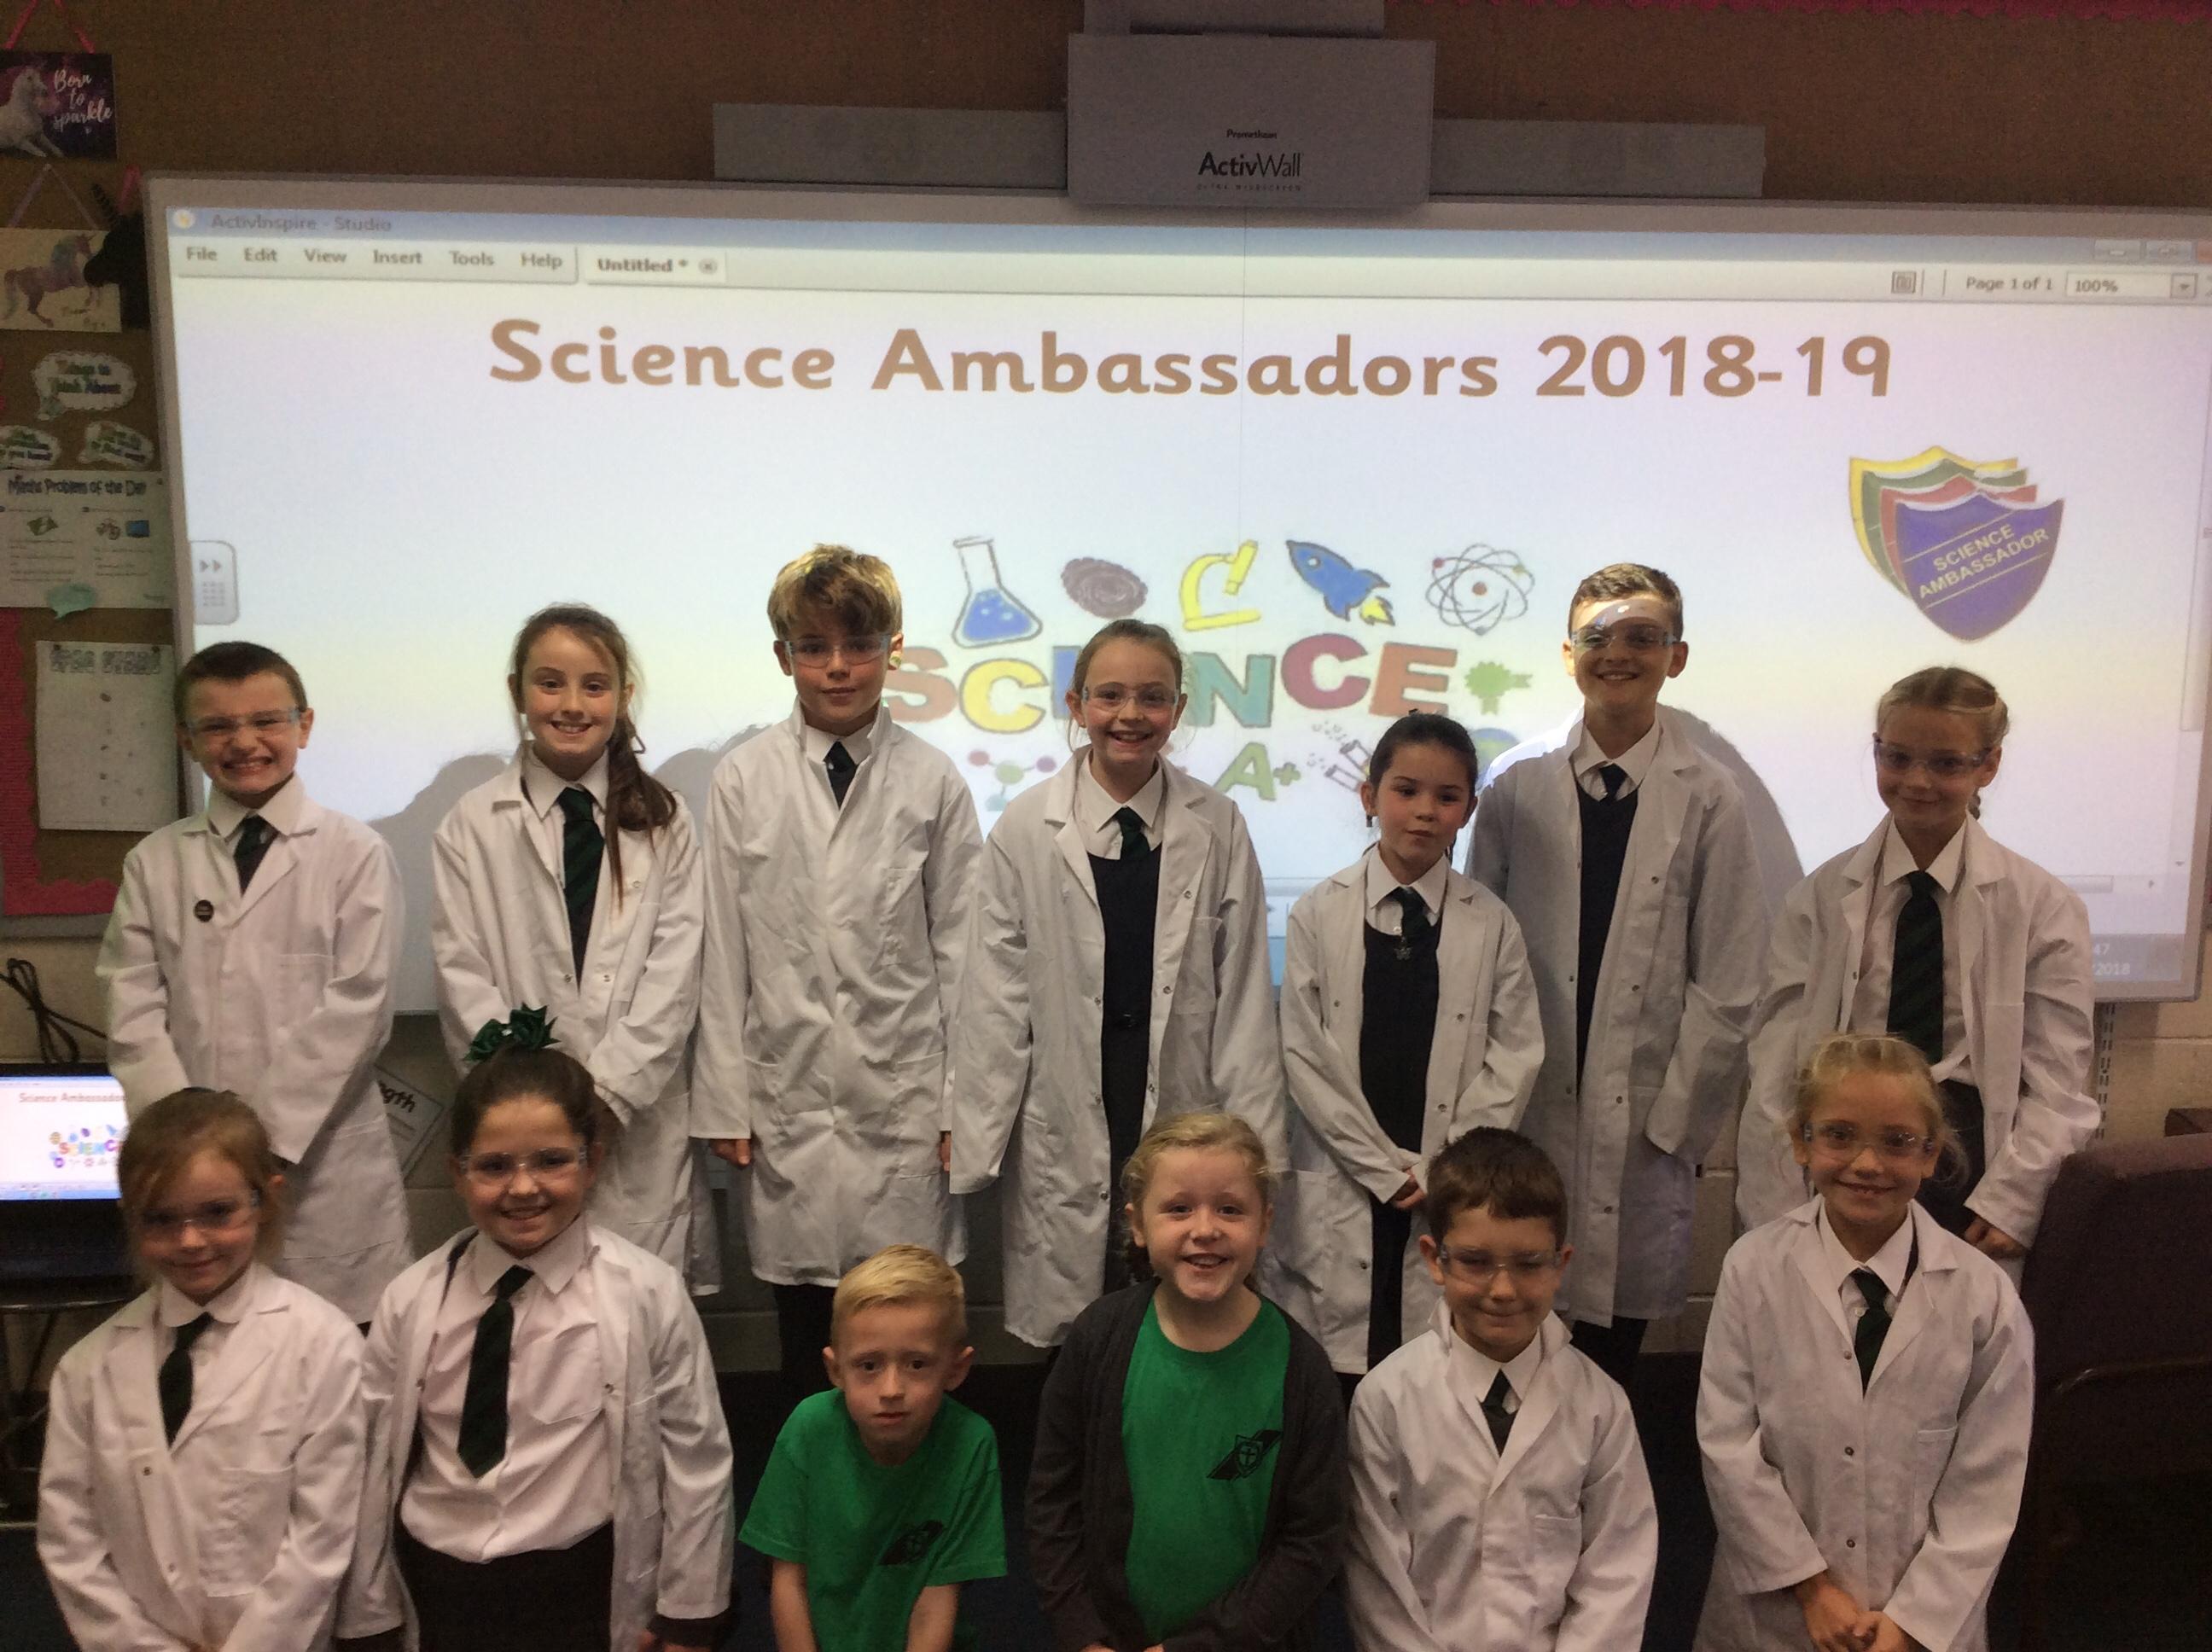 Science Ambassadors 2018-19